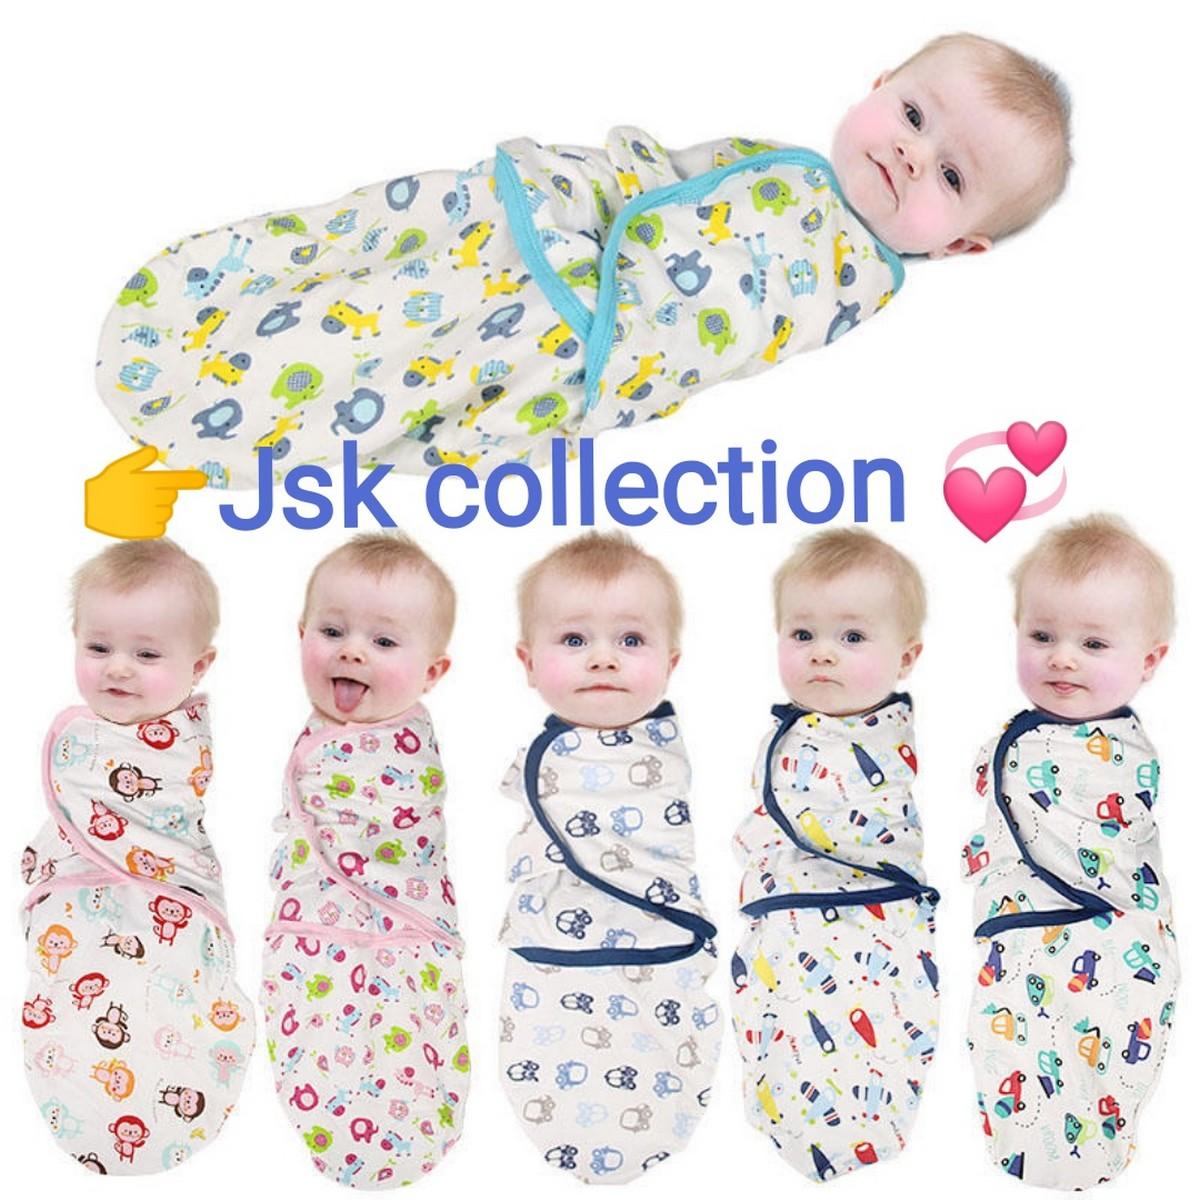 Summer SwaddleMe Assorted Design infant Adjustable Wrap Cotton Swaddle Wrapping Sheet